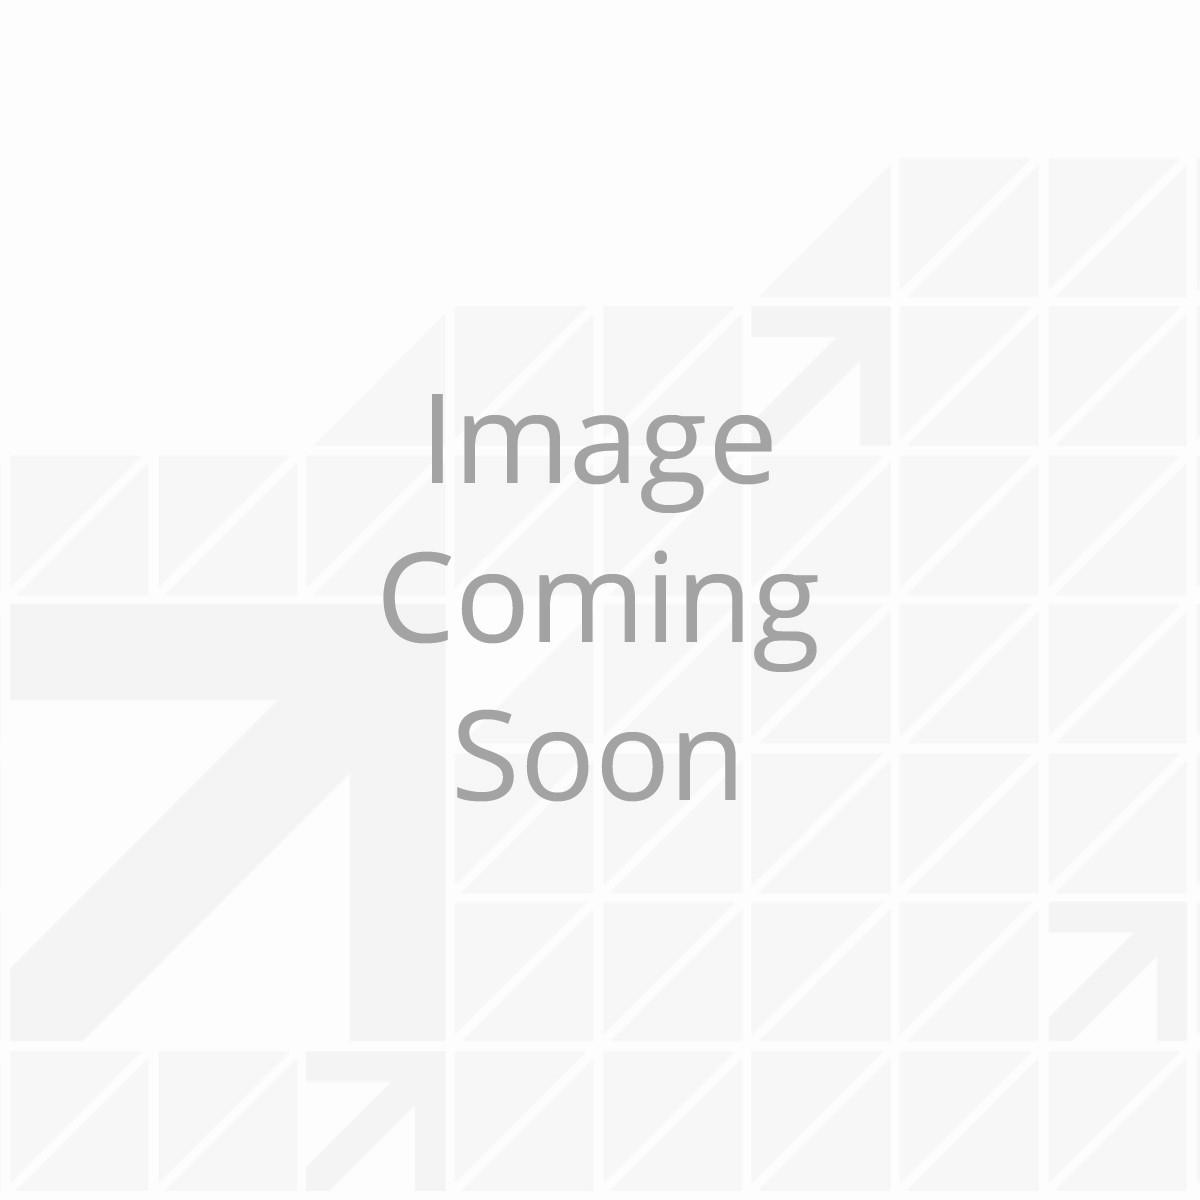 140998_Hex-Plug_001